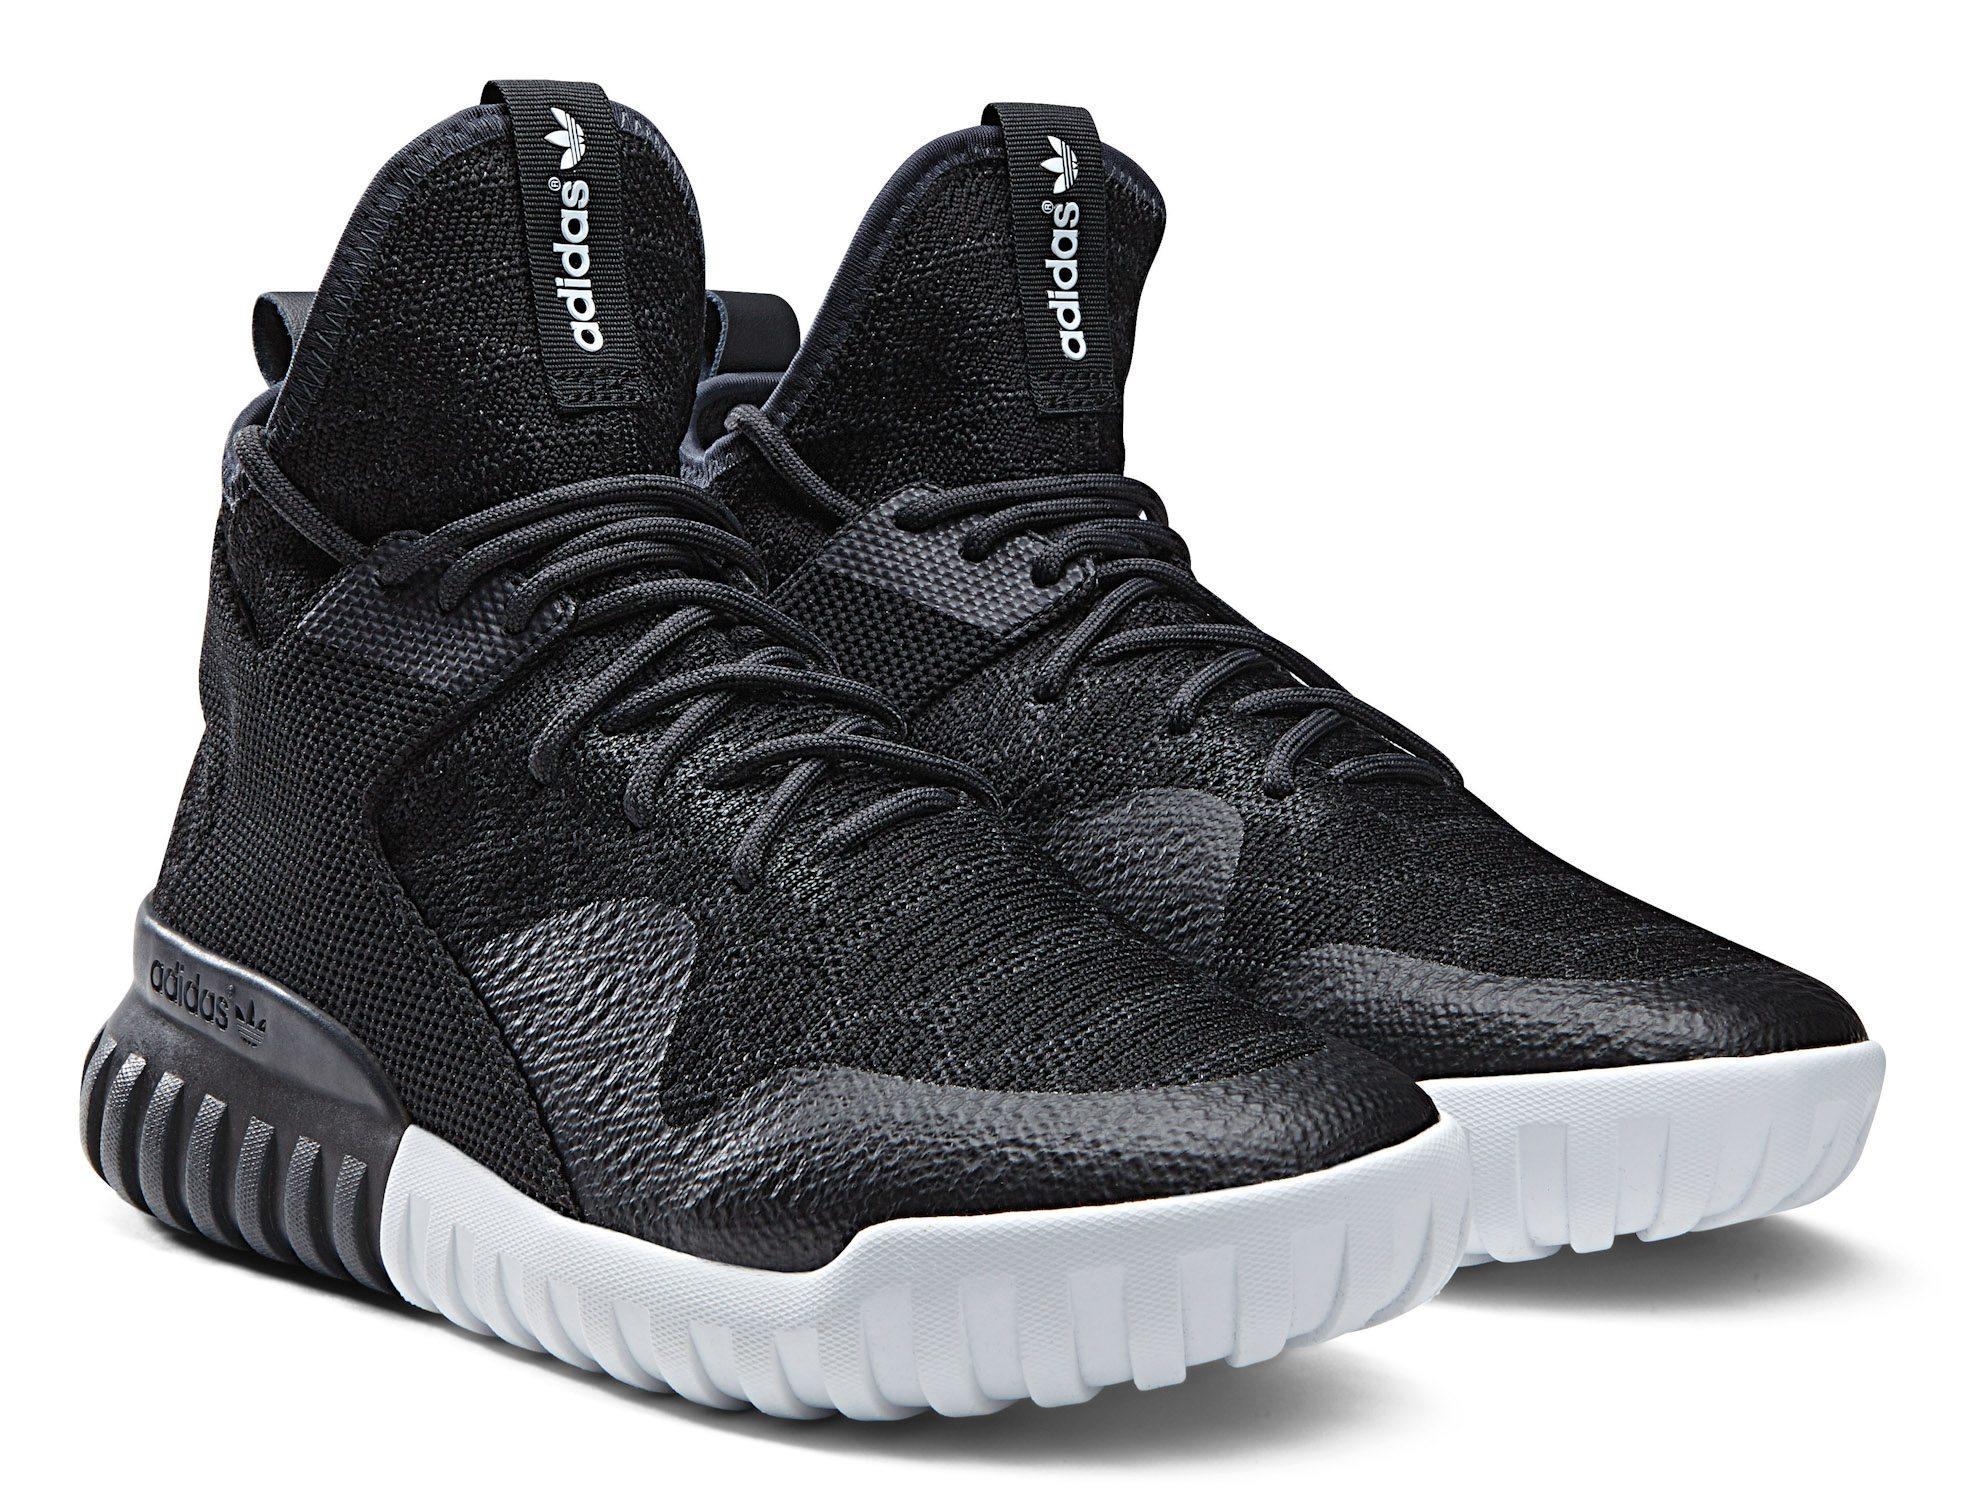 adidas Originals Tubular X Primeknit Snake 2